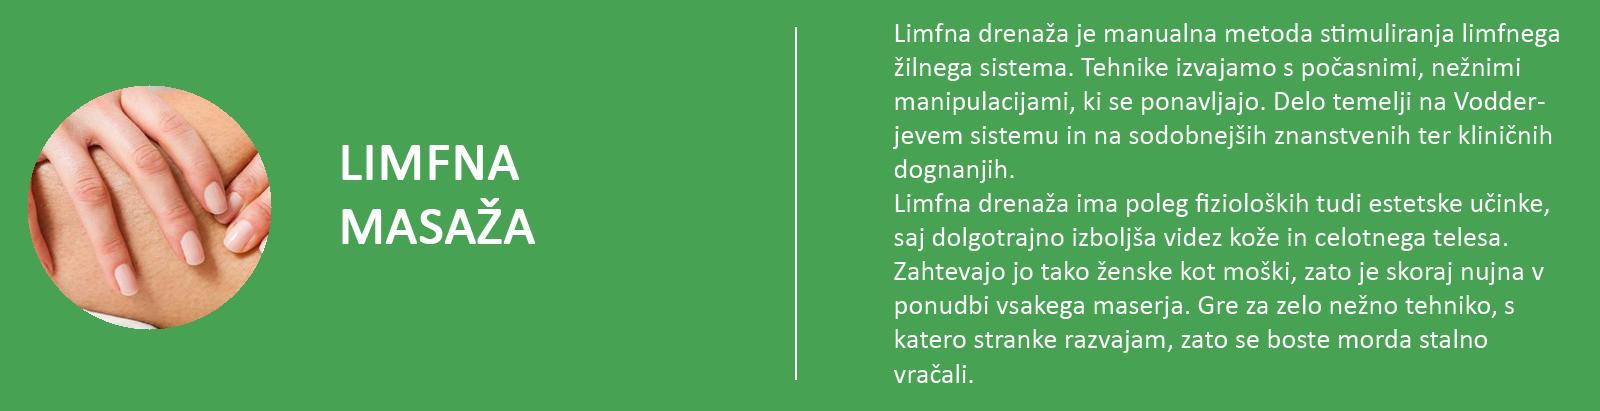 limfna